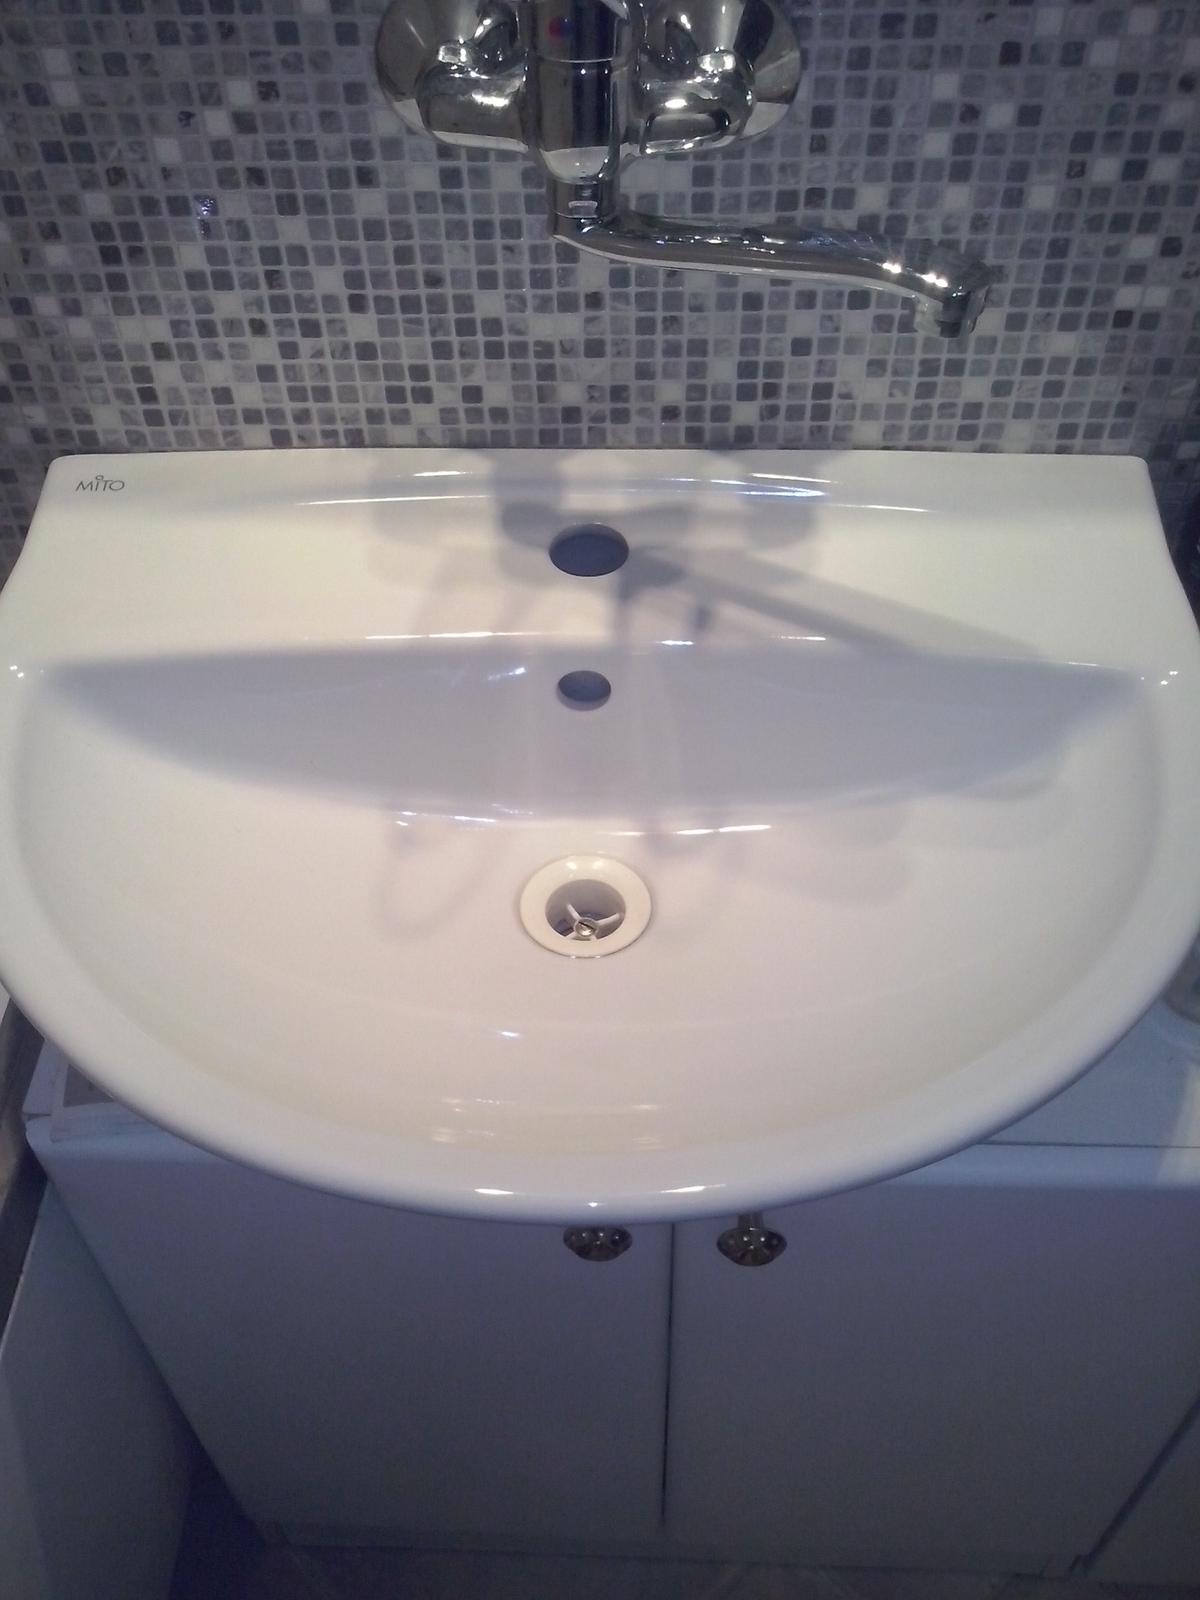 Keramicke umyvadlo - Obrázok č. 1